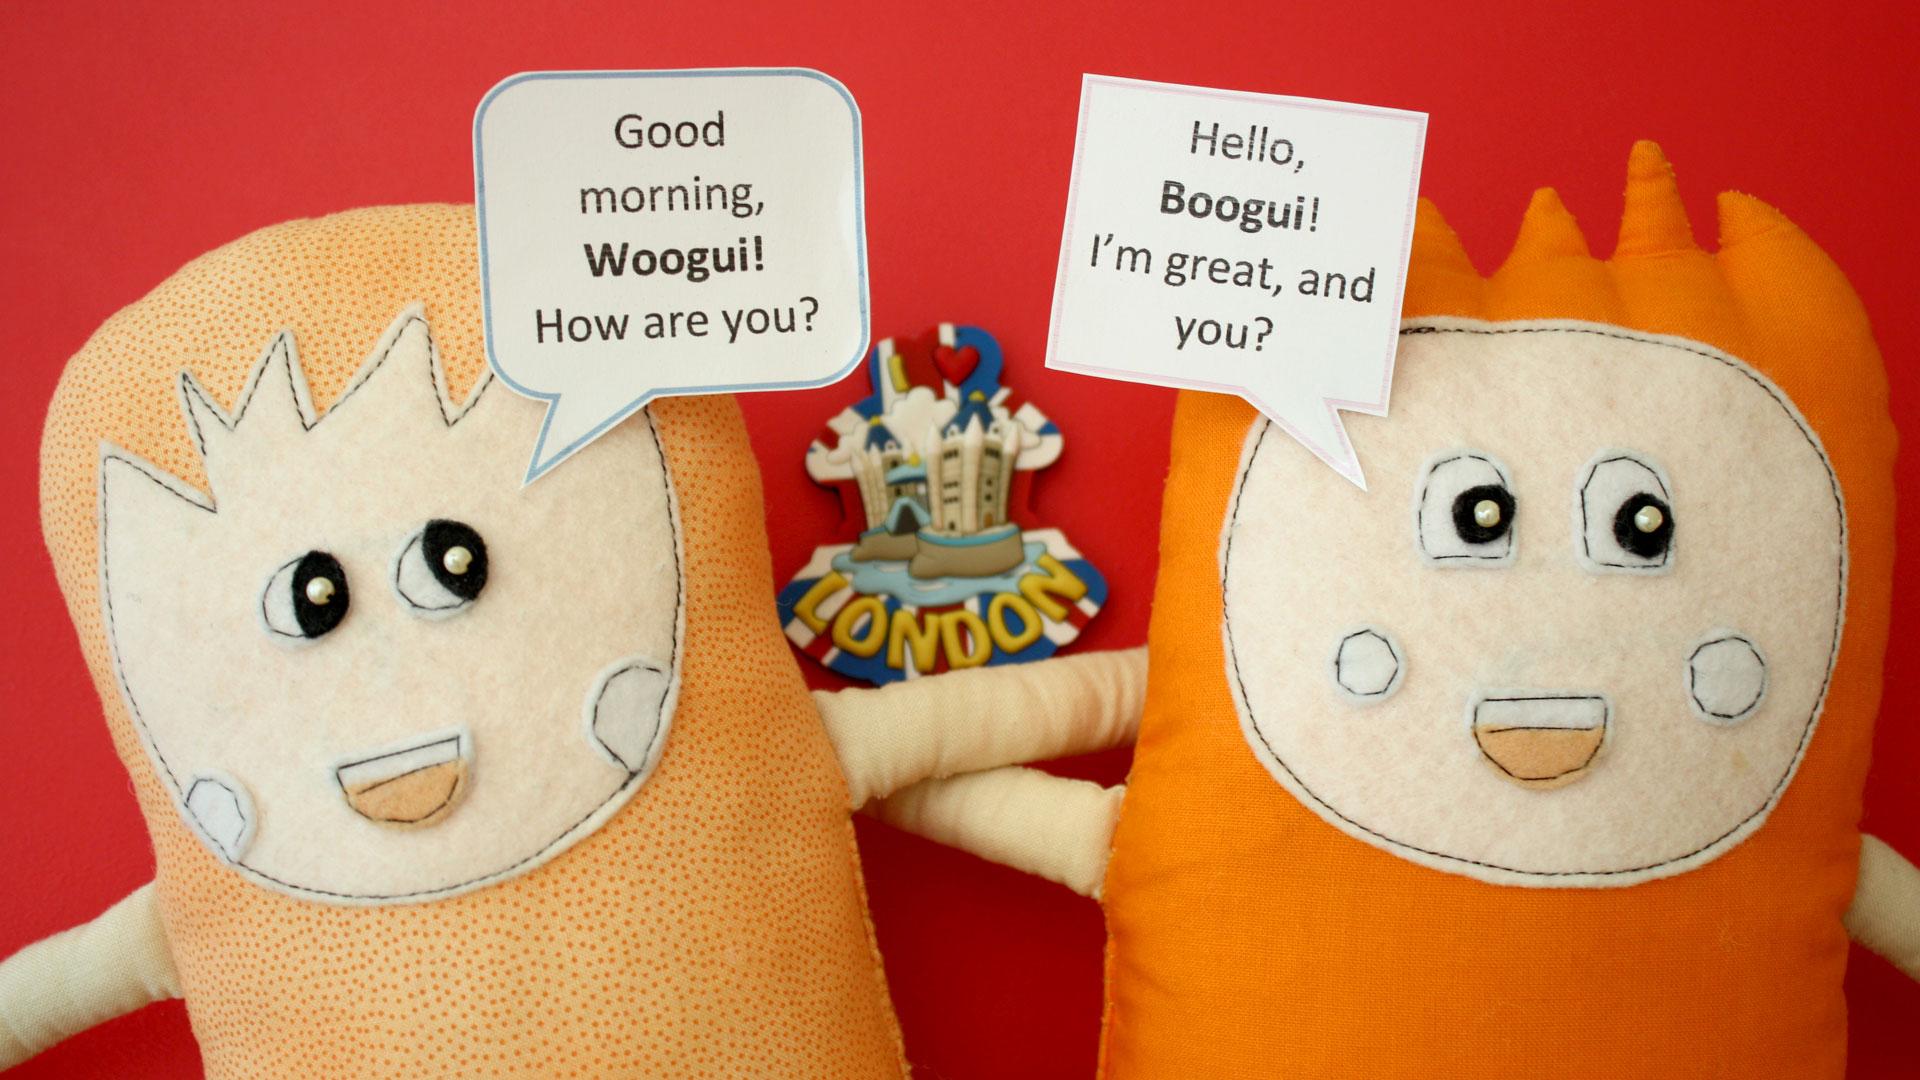 Inglês Woogui Boogui